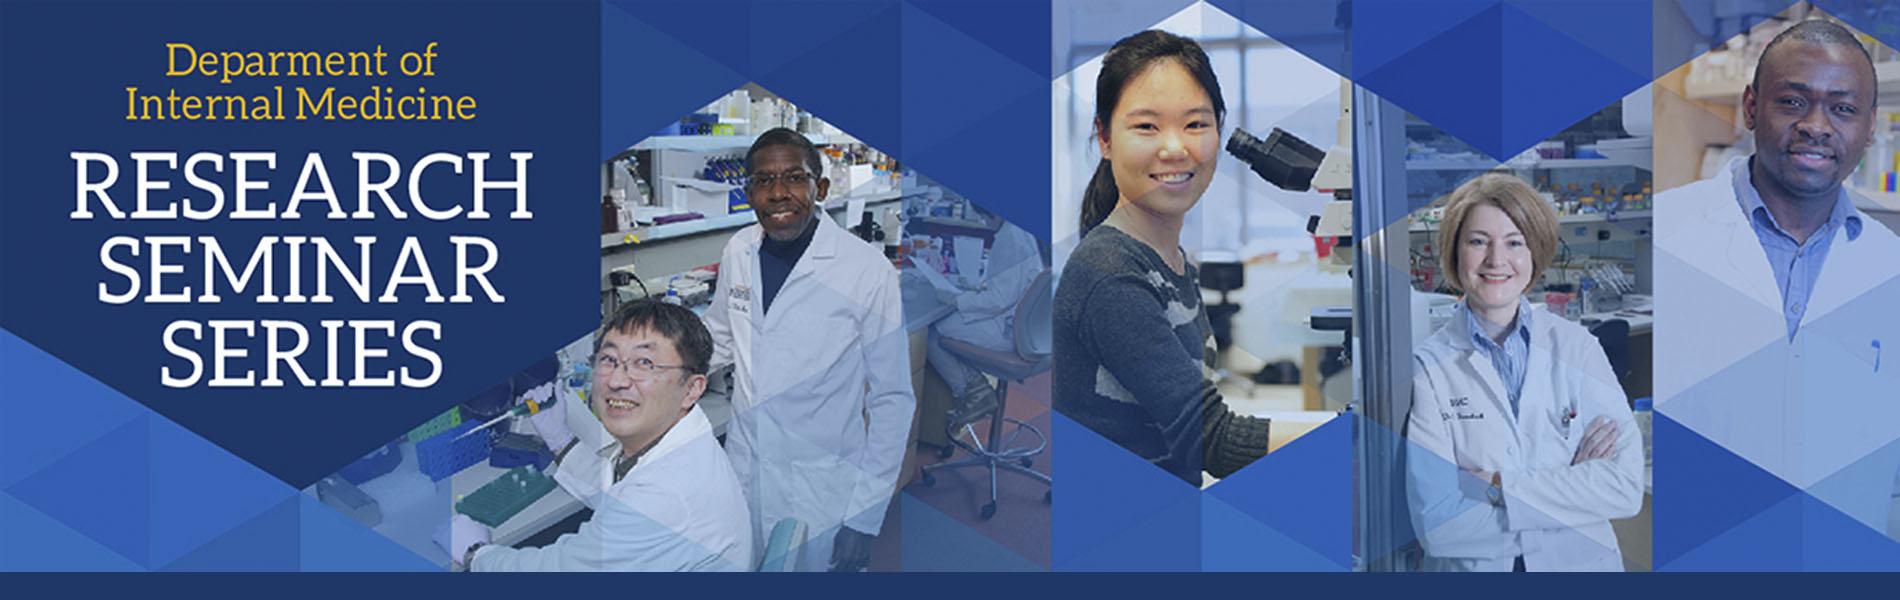 Banner: Internal Medicine Research Seminar Series